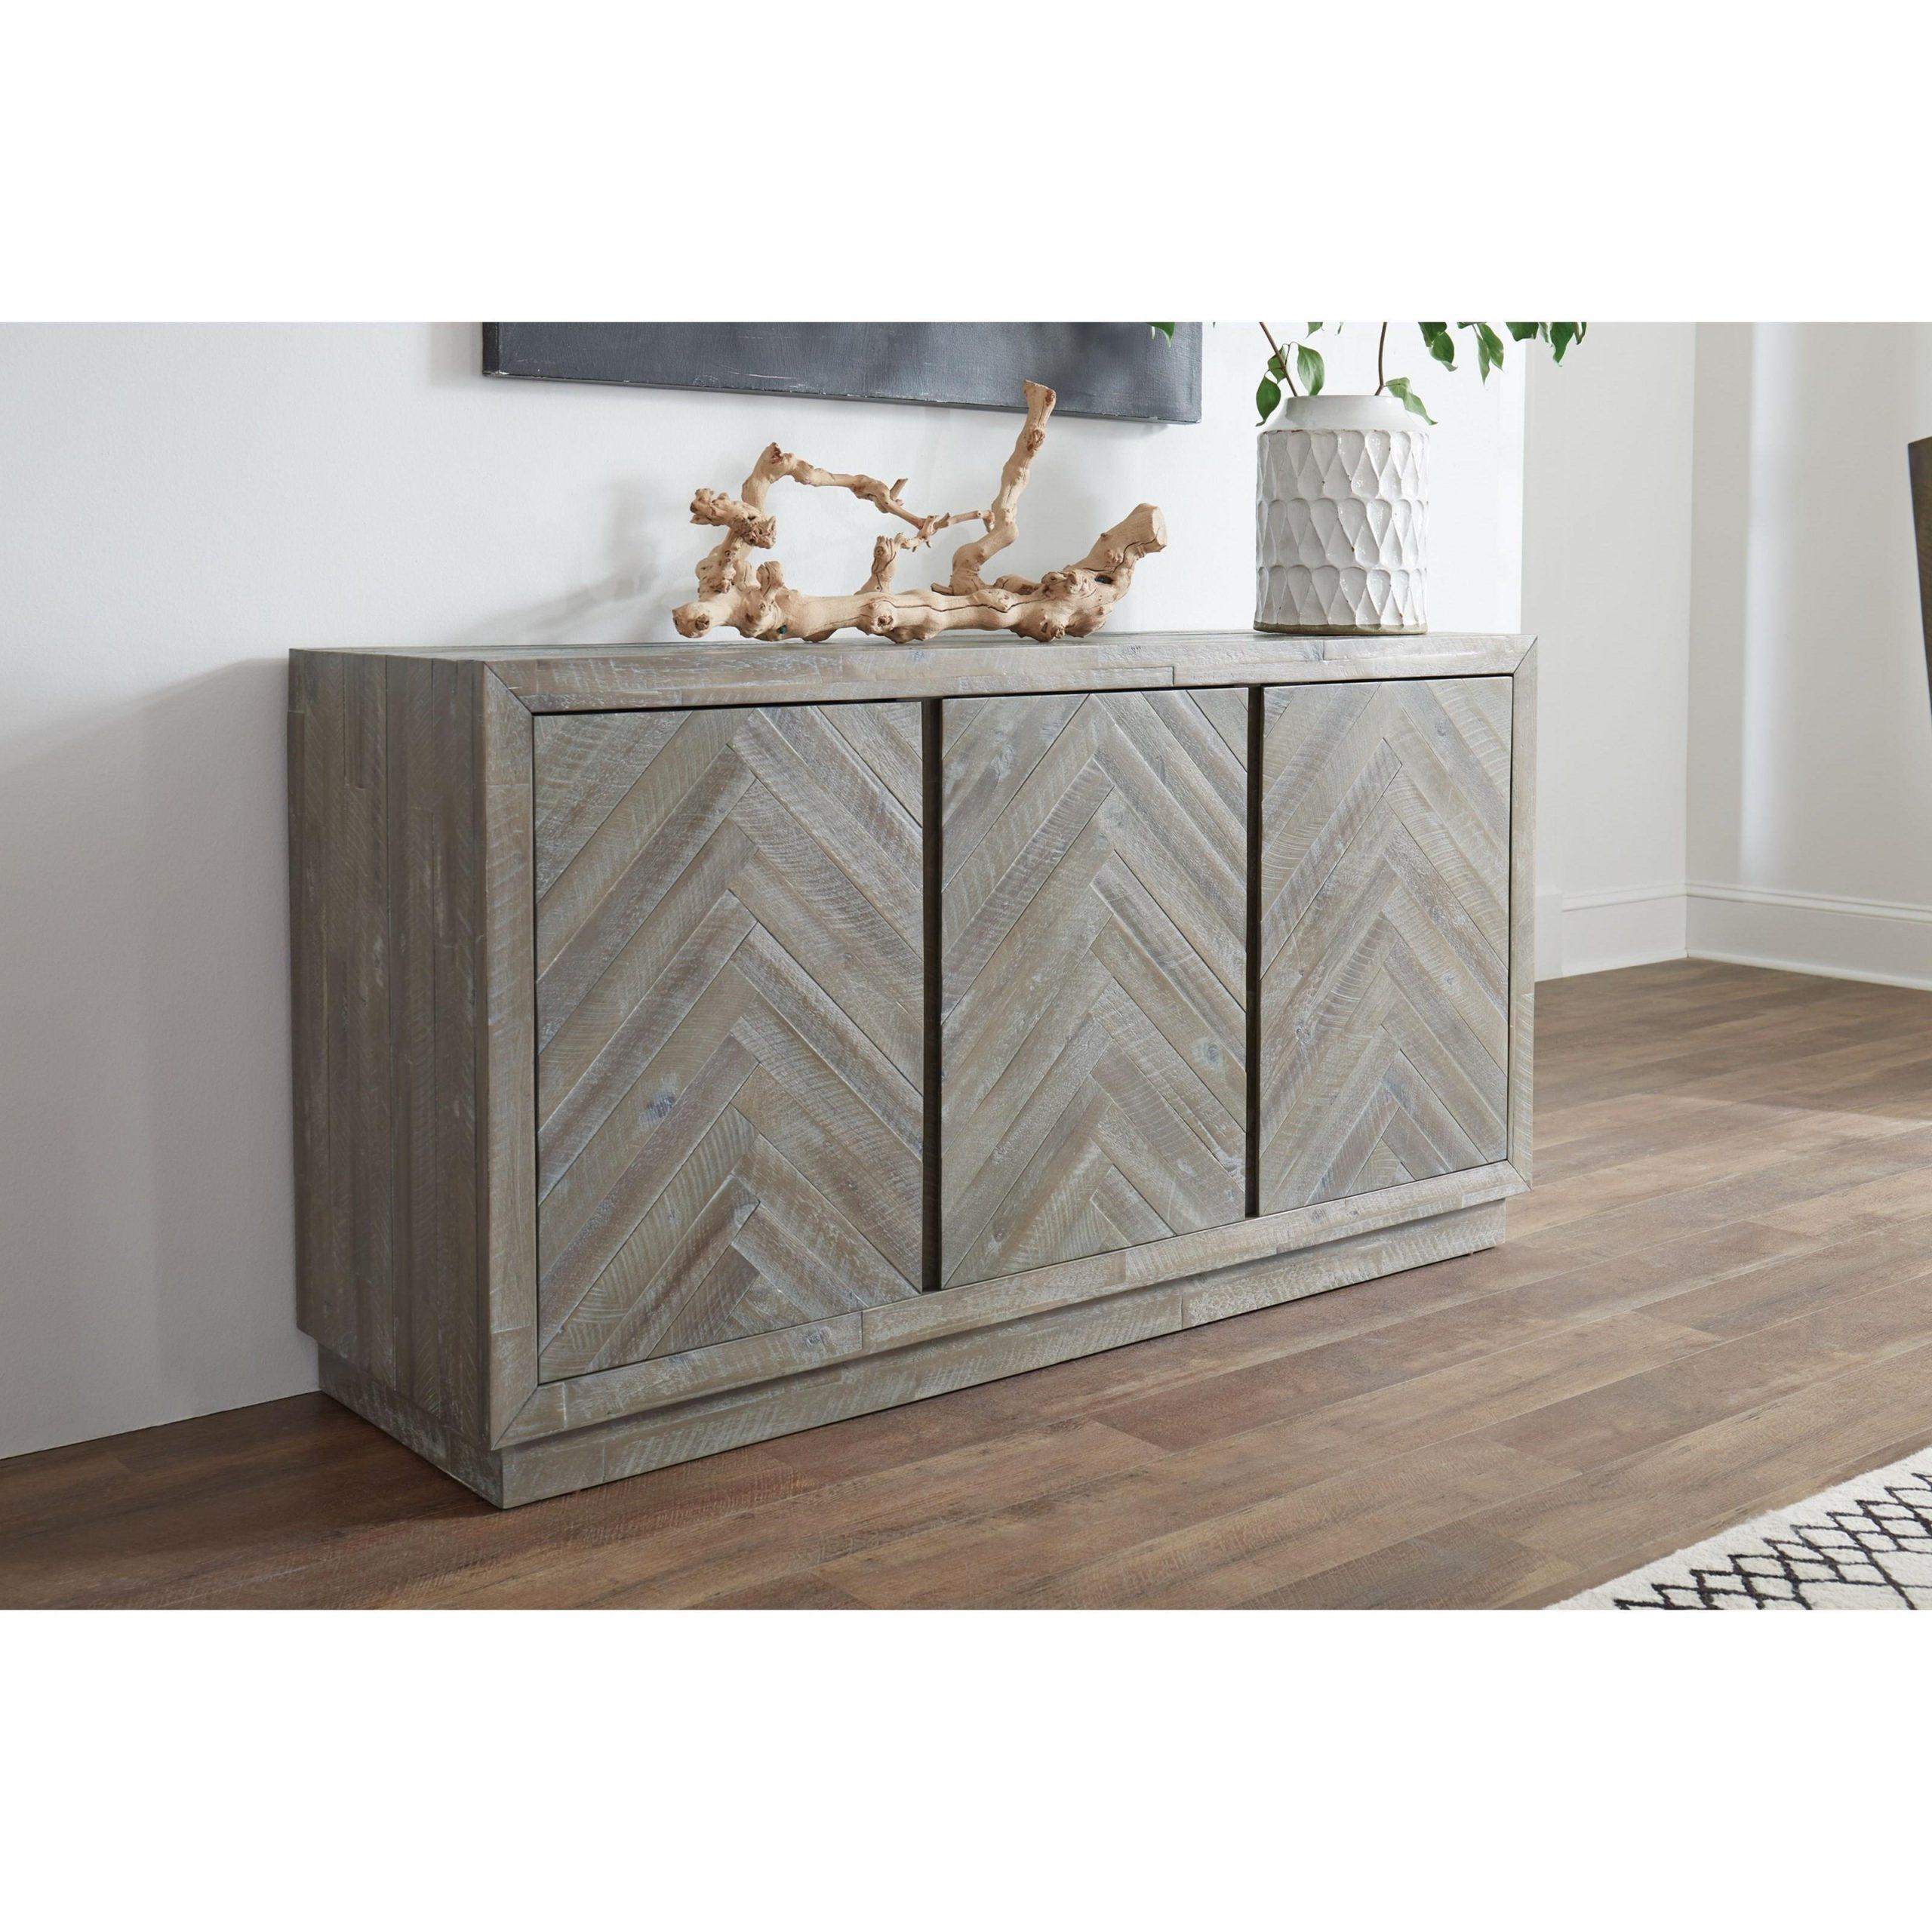 "Trendy Modus International Herringbone Contemporary Sideboard Throughout Herringbone 48"" Wide Buffet Tables (View 4 of 20)"